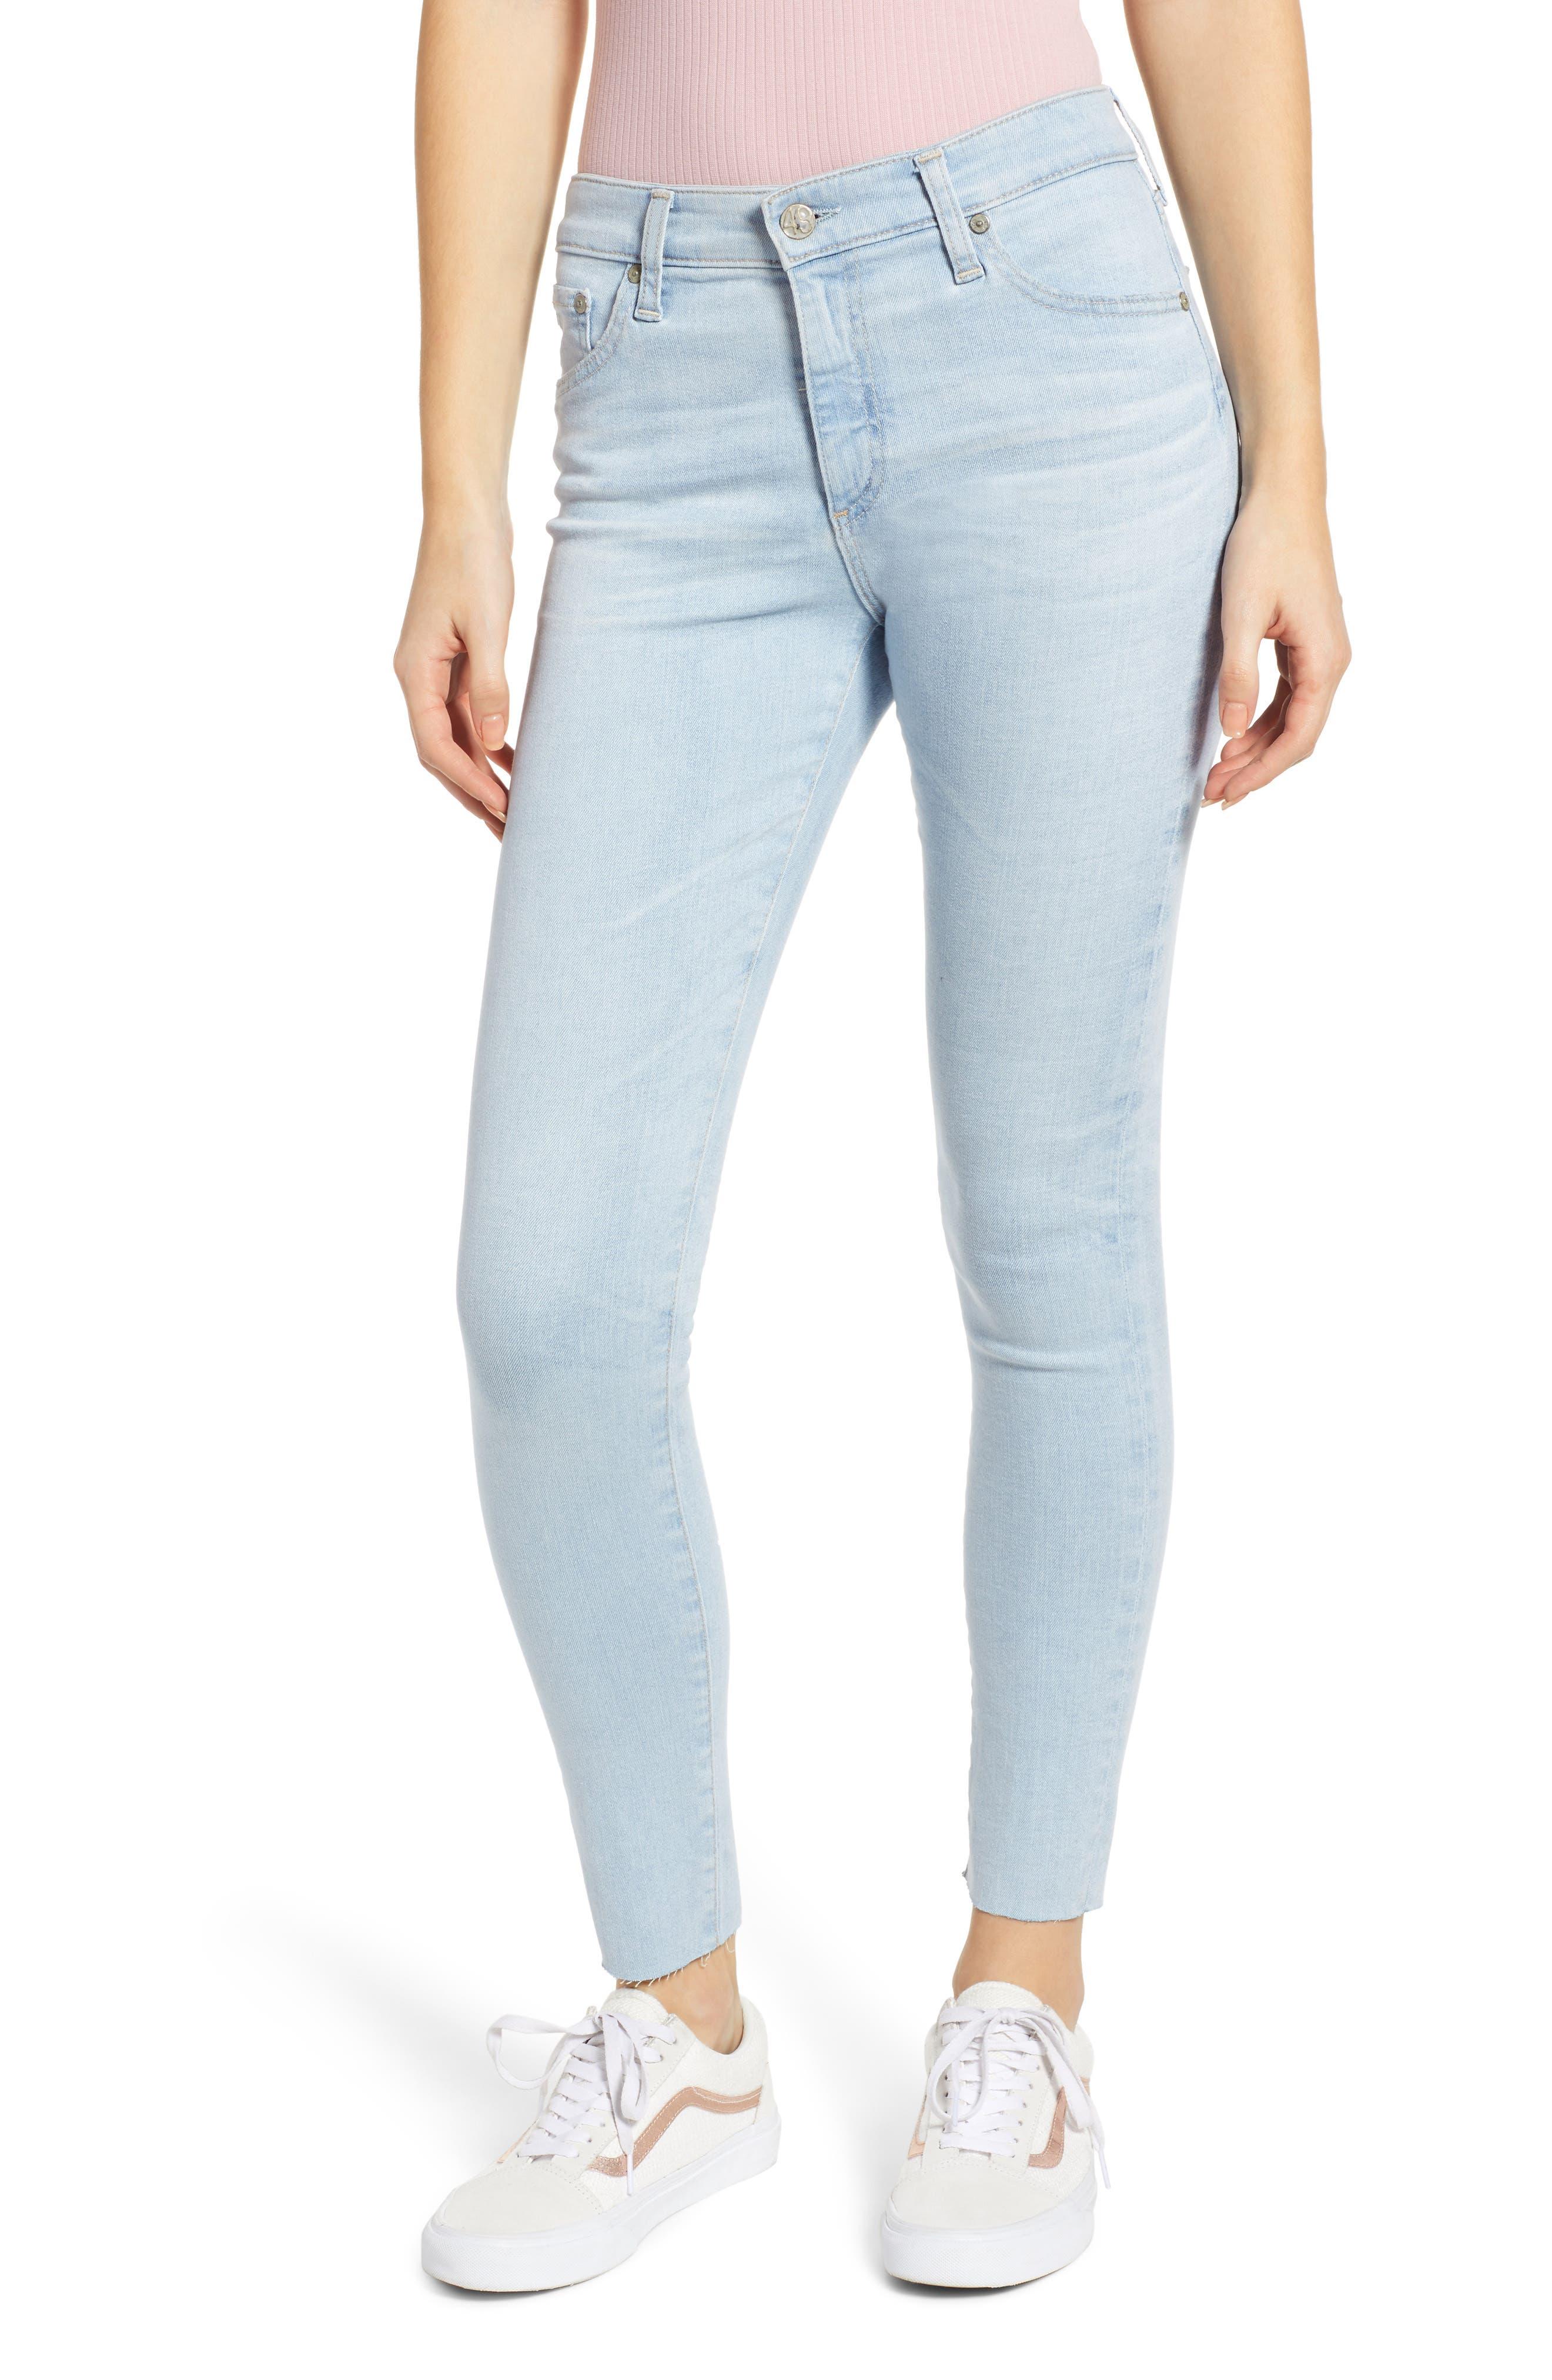 AG The Farrah High Waist Ankle Skinny Jeans, Main, color, 27 YEARS SHINING